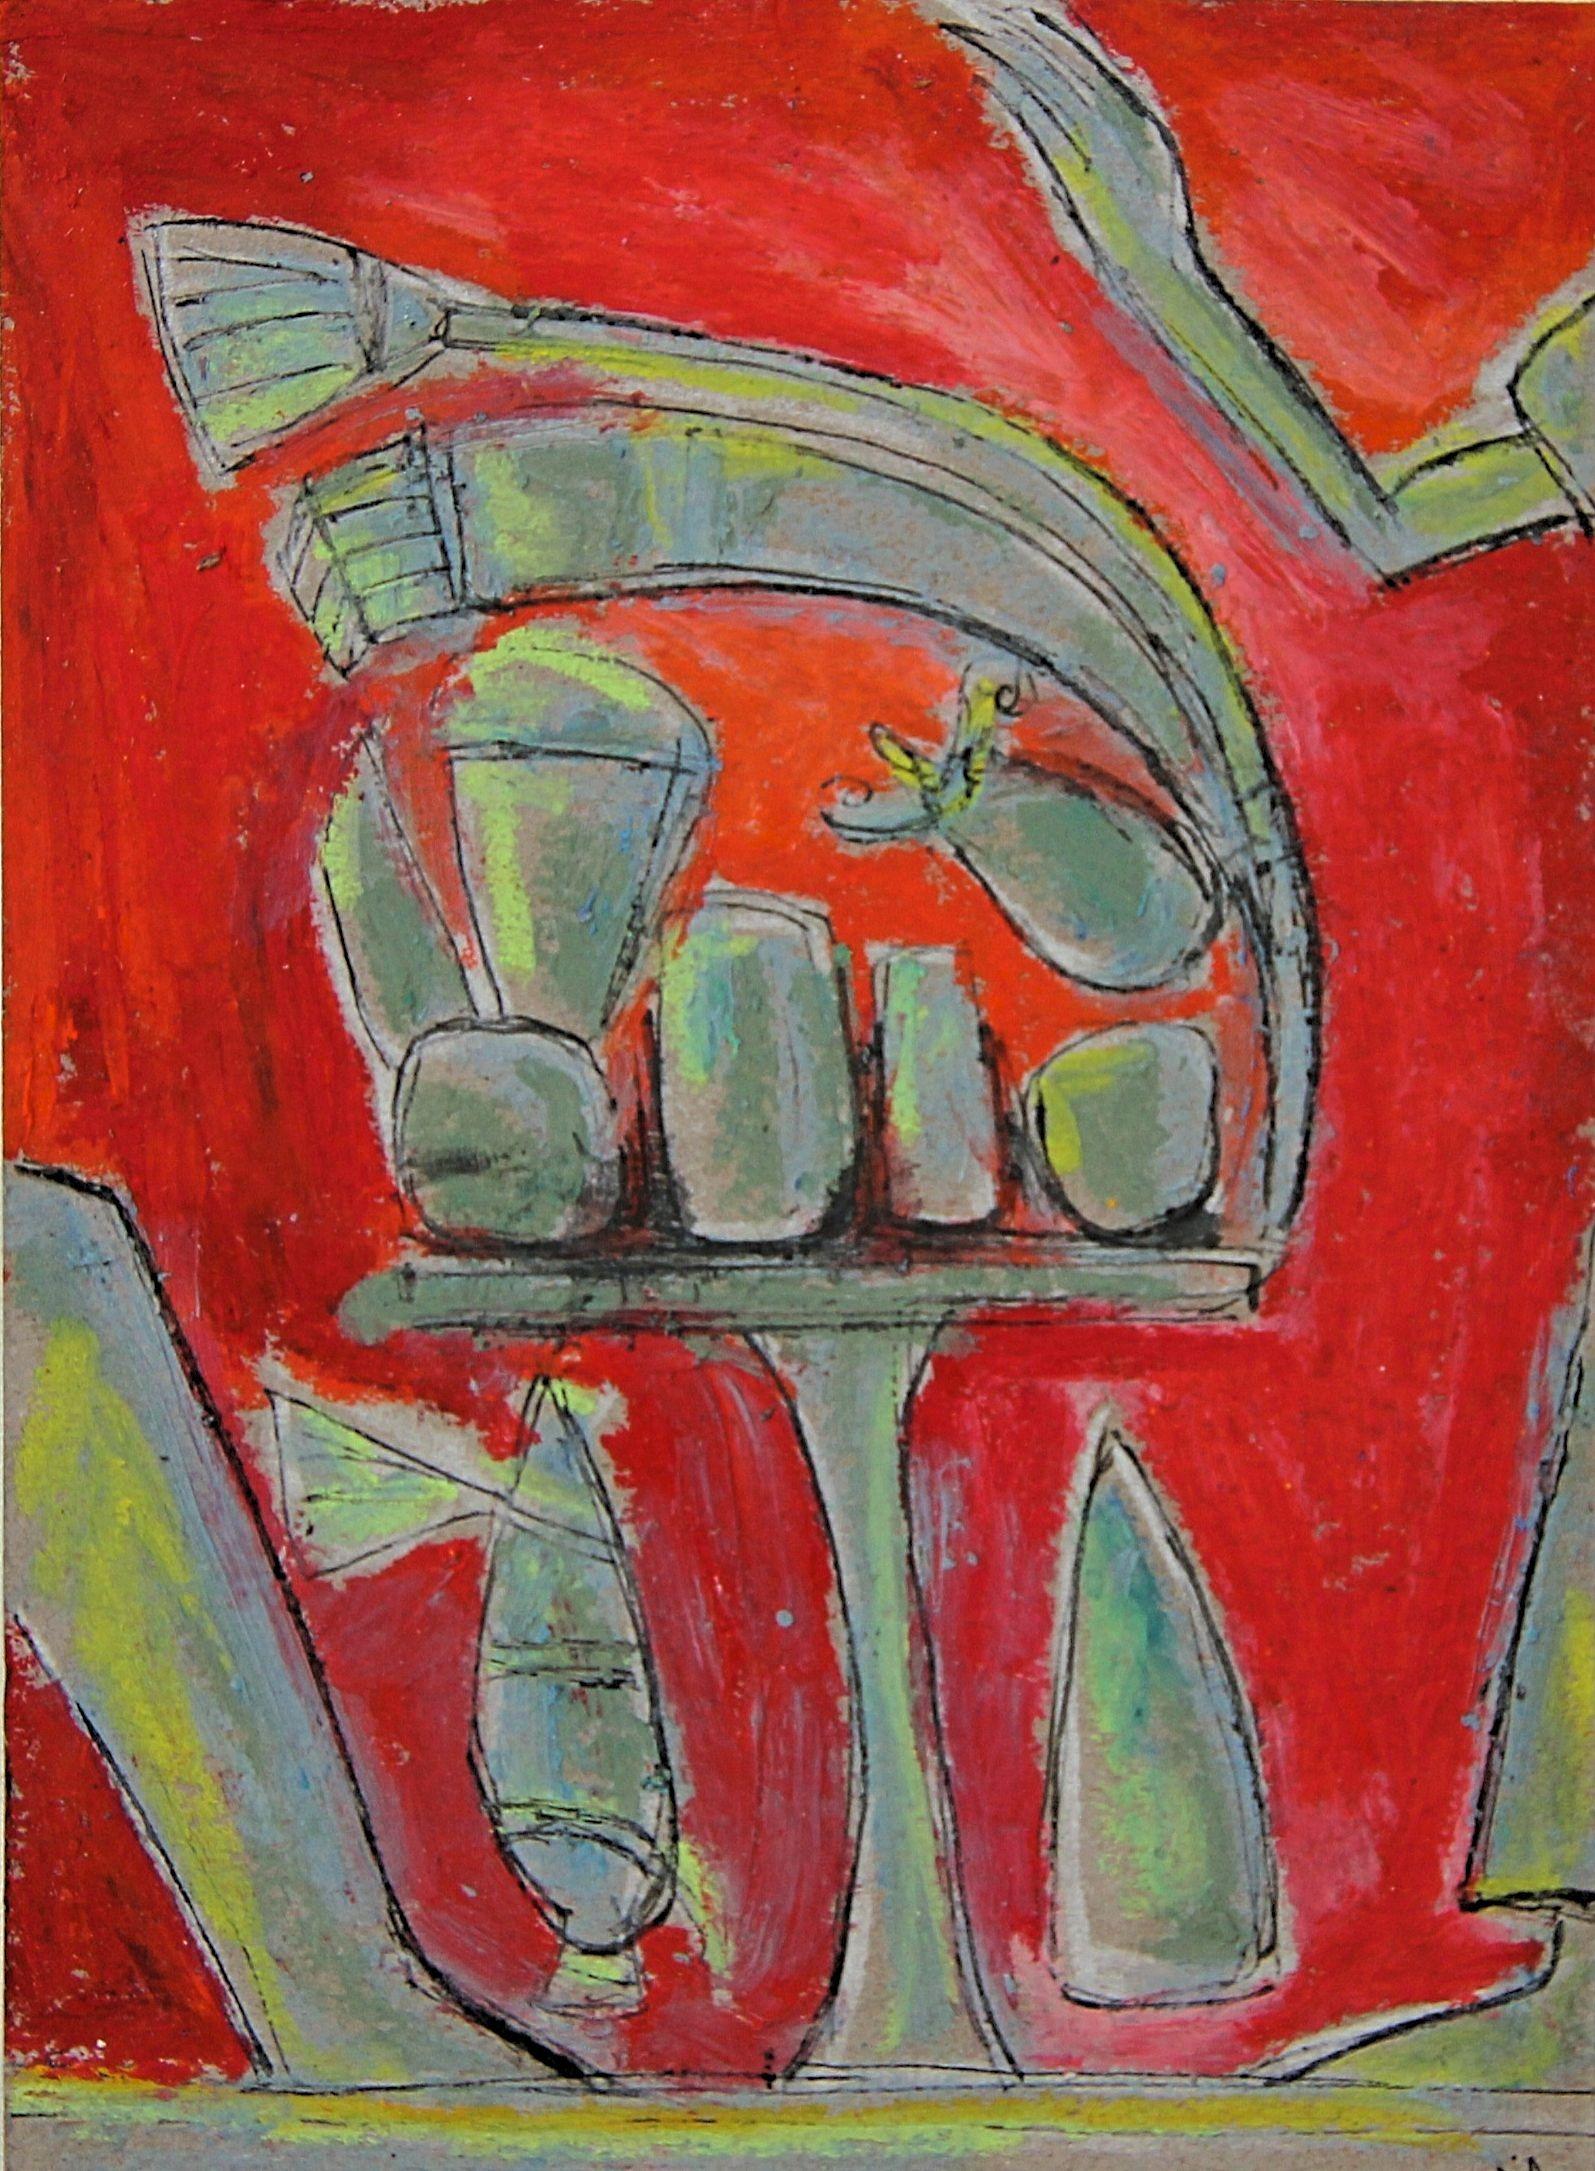 Egyptian Table Red.jpg